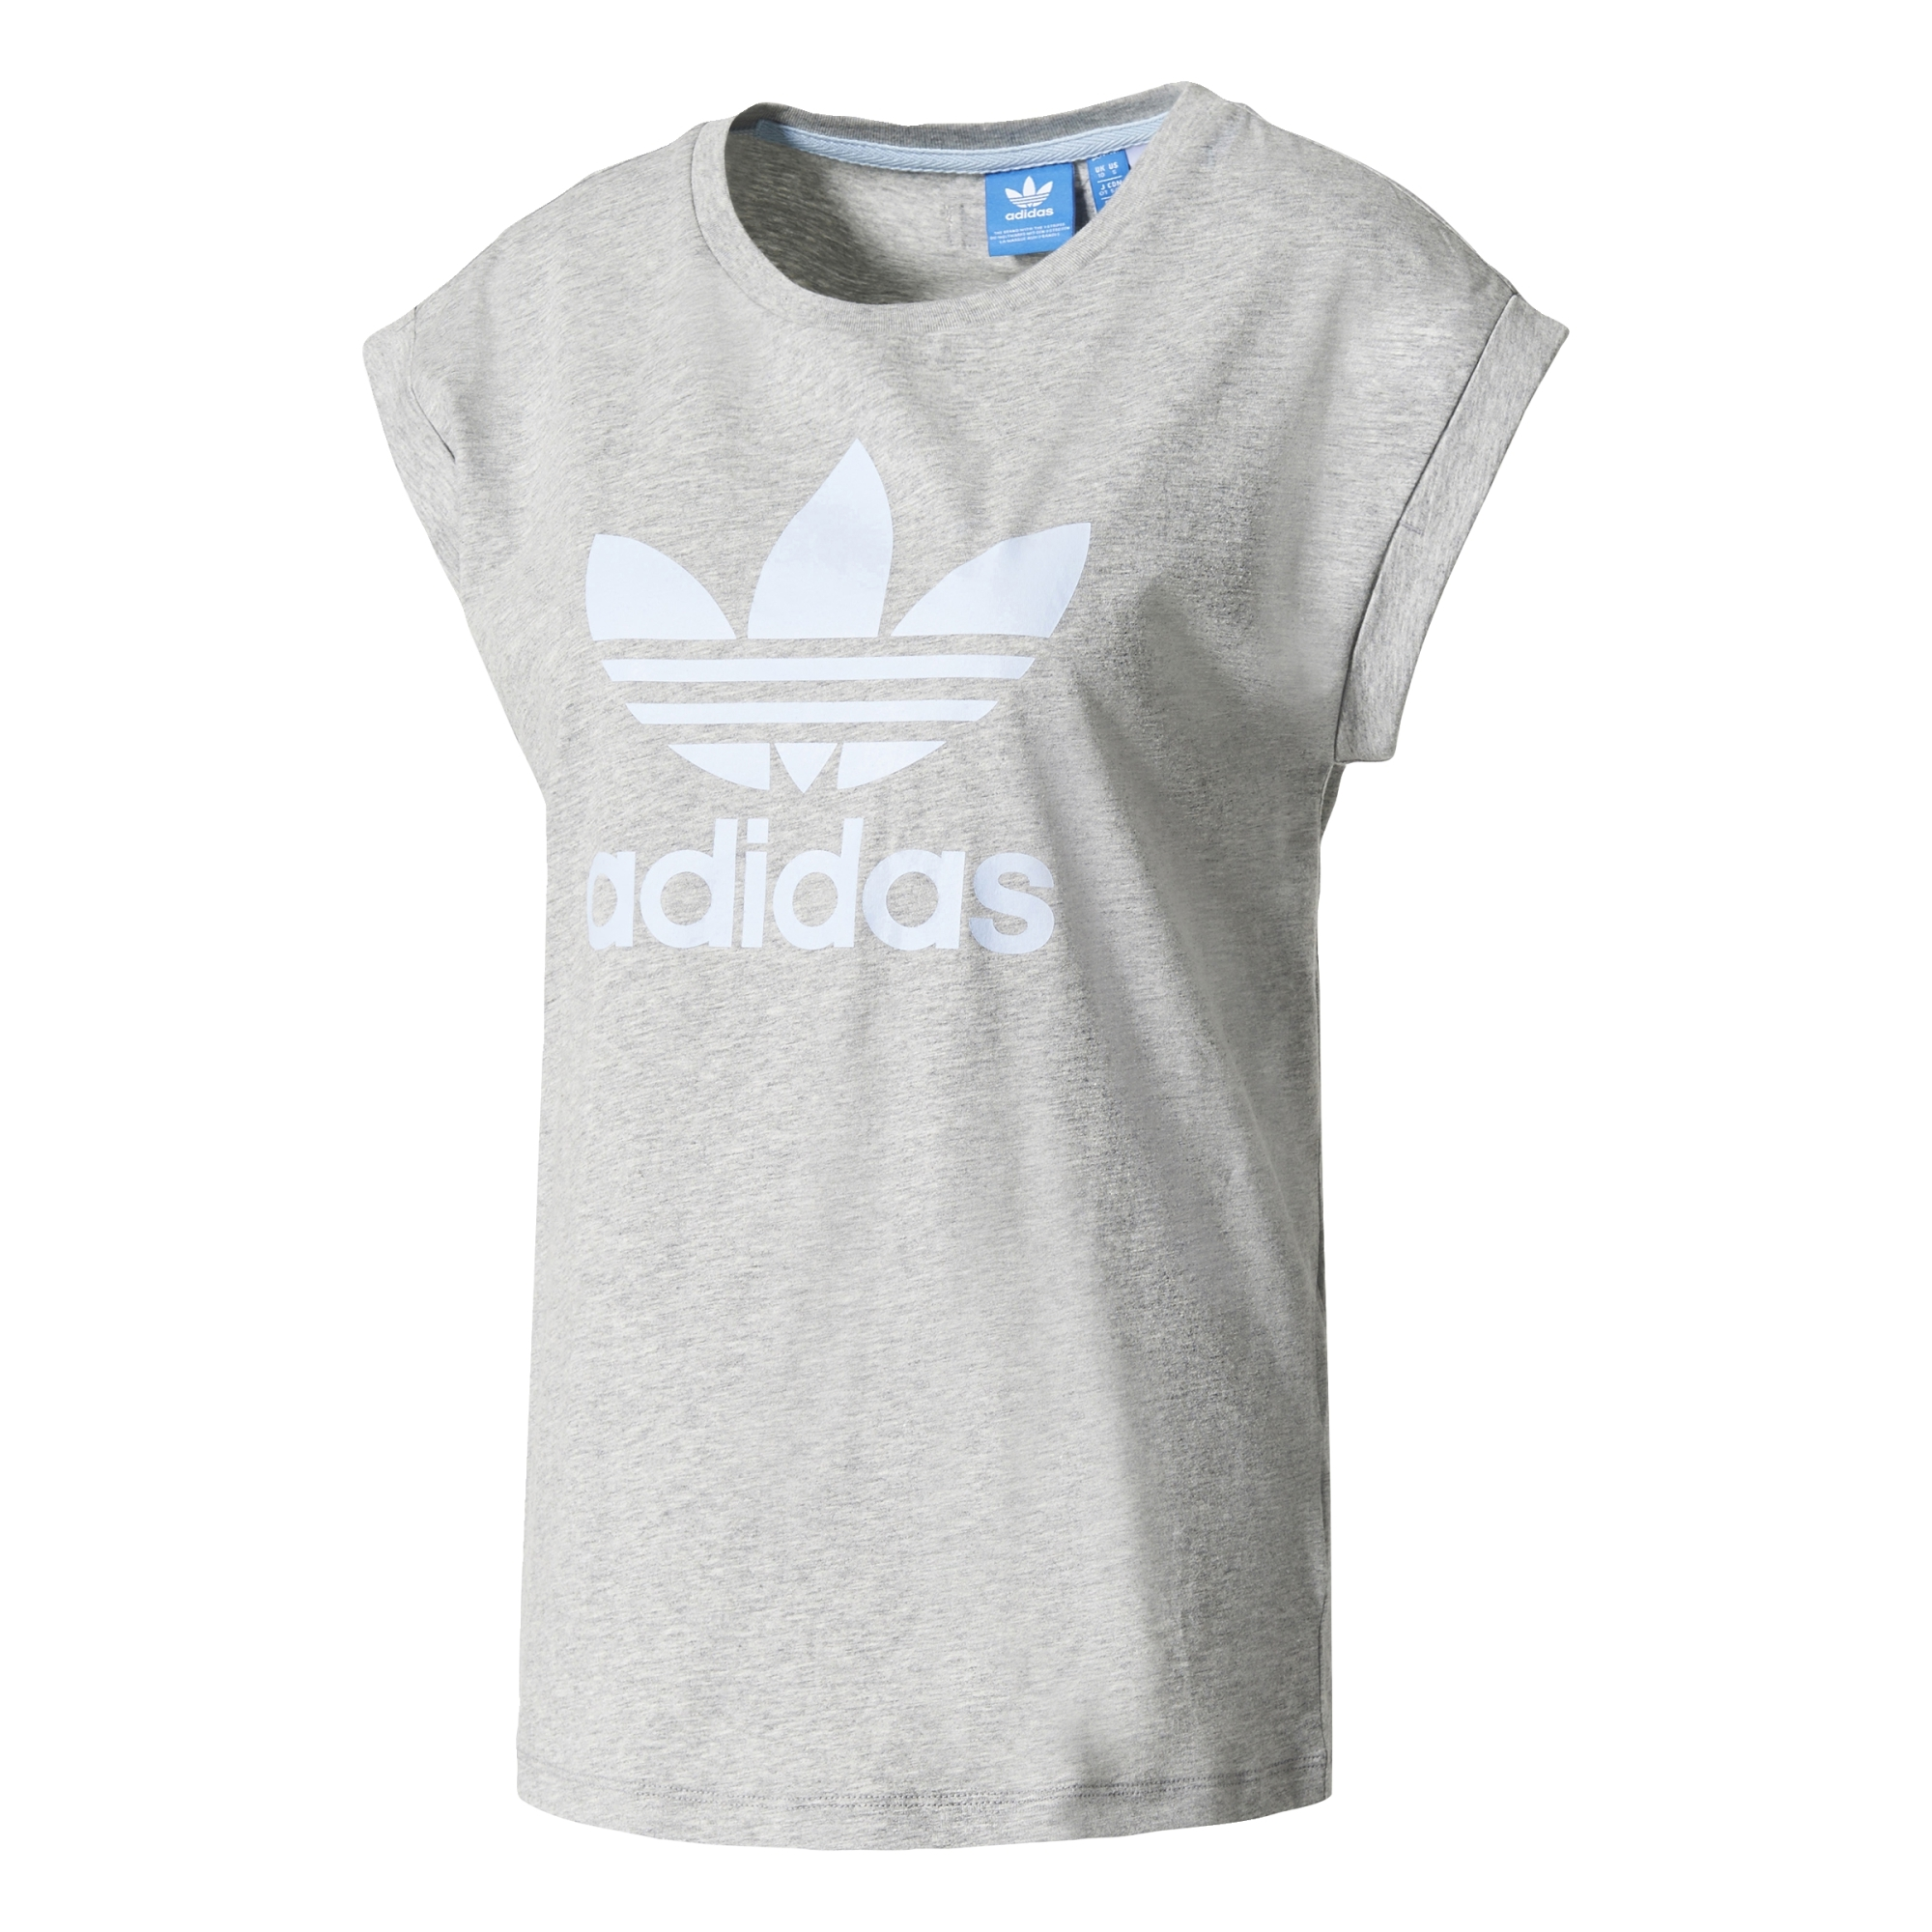 Adidas Originals W Boyfriend Roll-Up Tee (medium grey heather) 52bb180021712